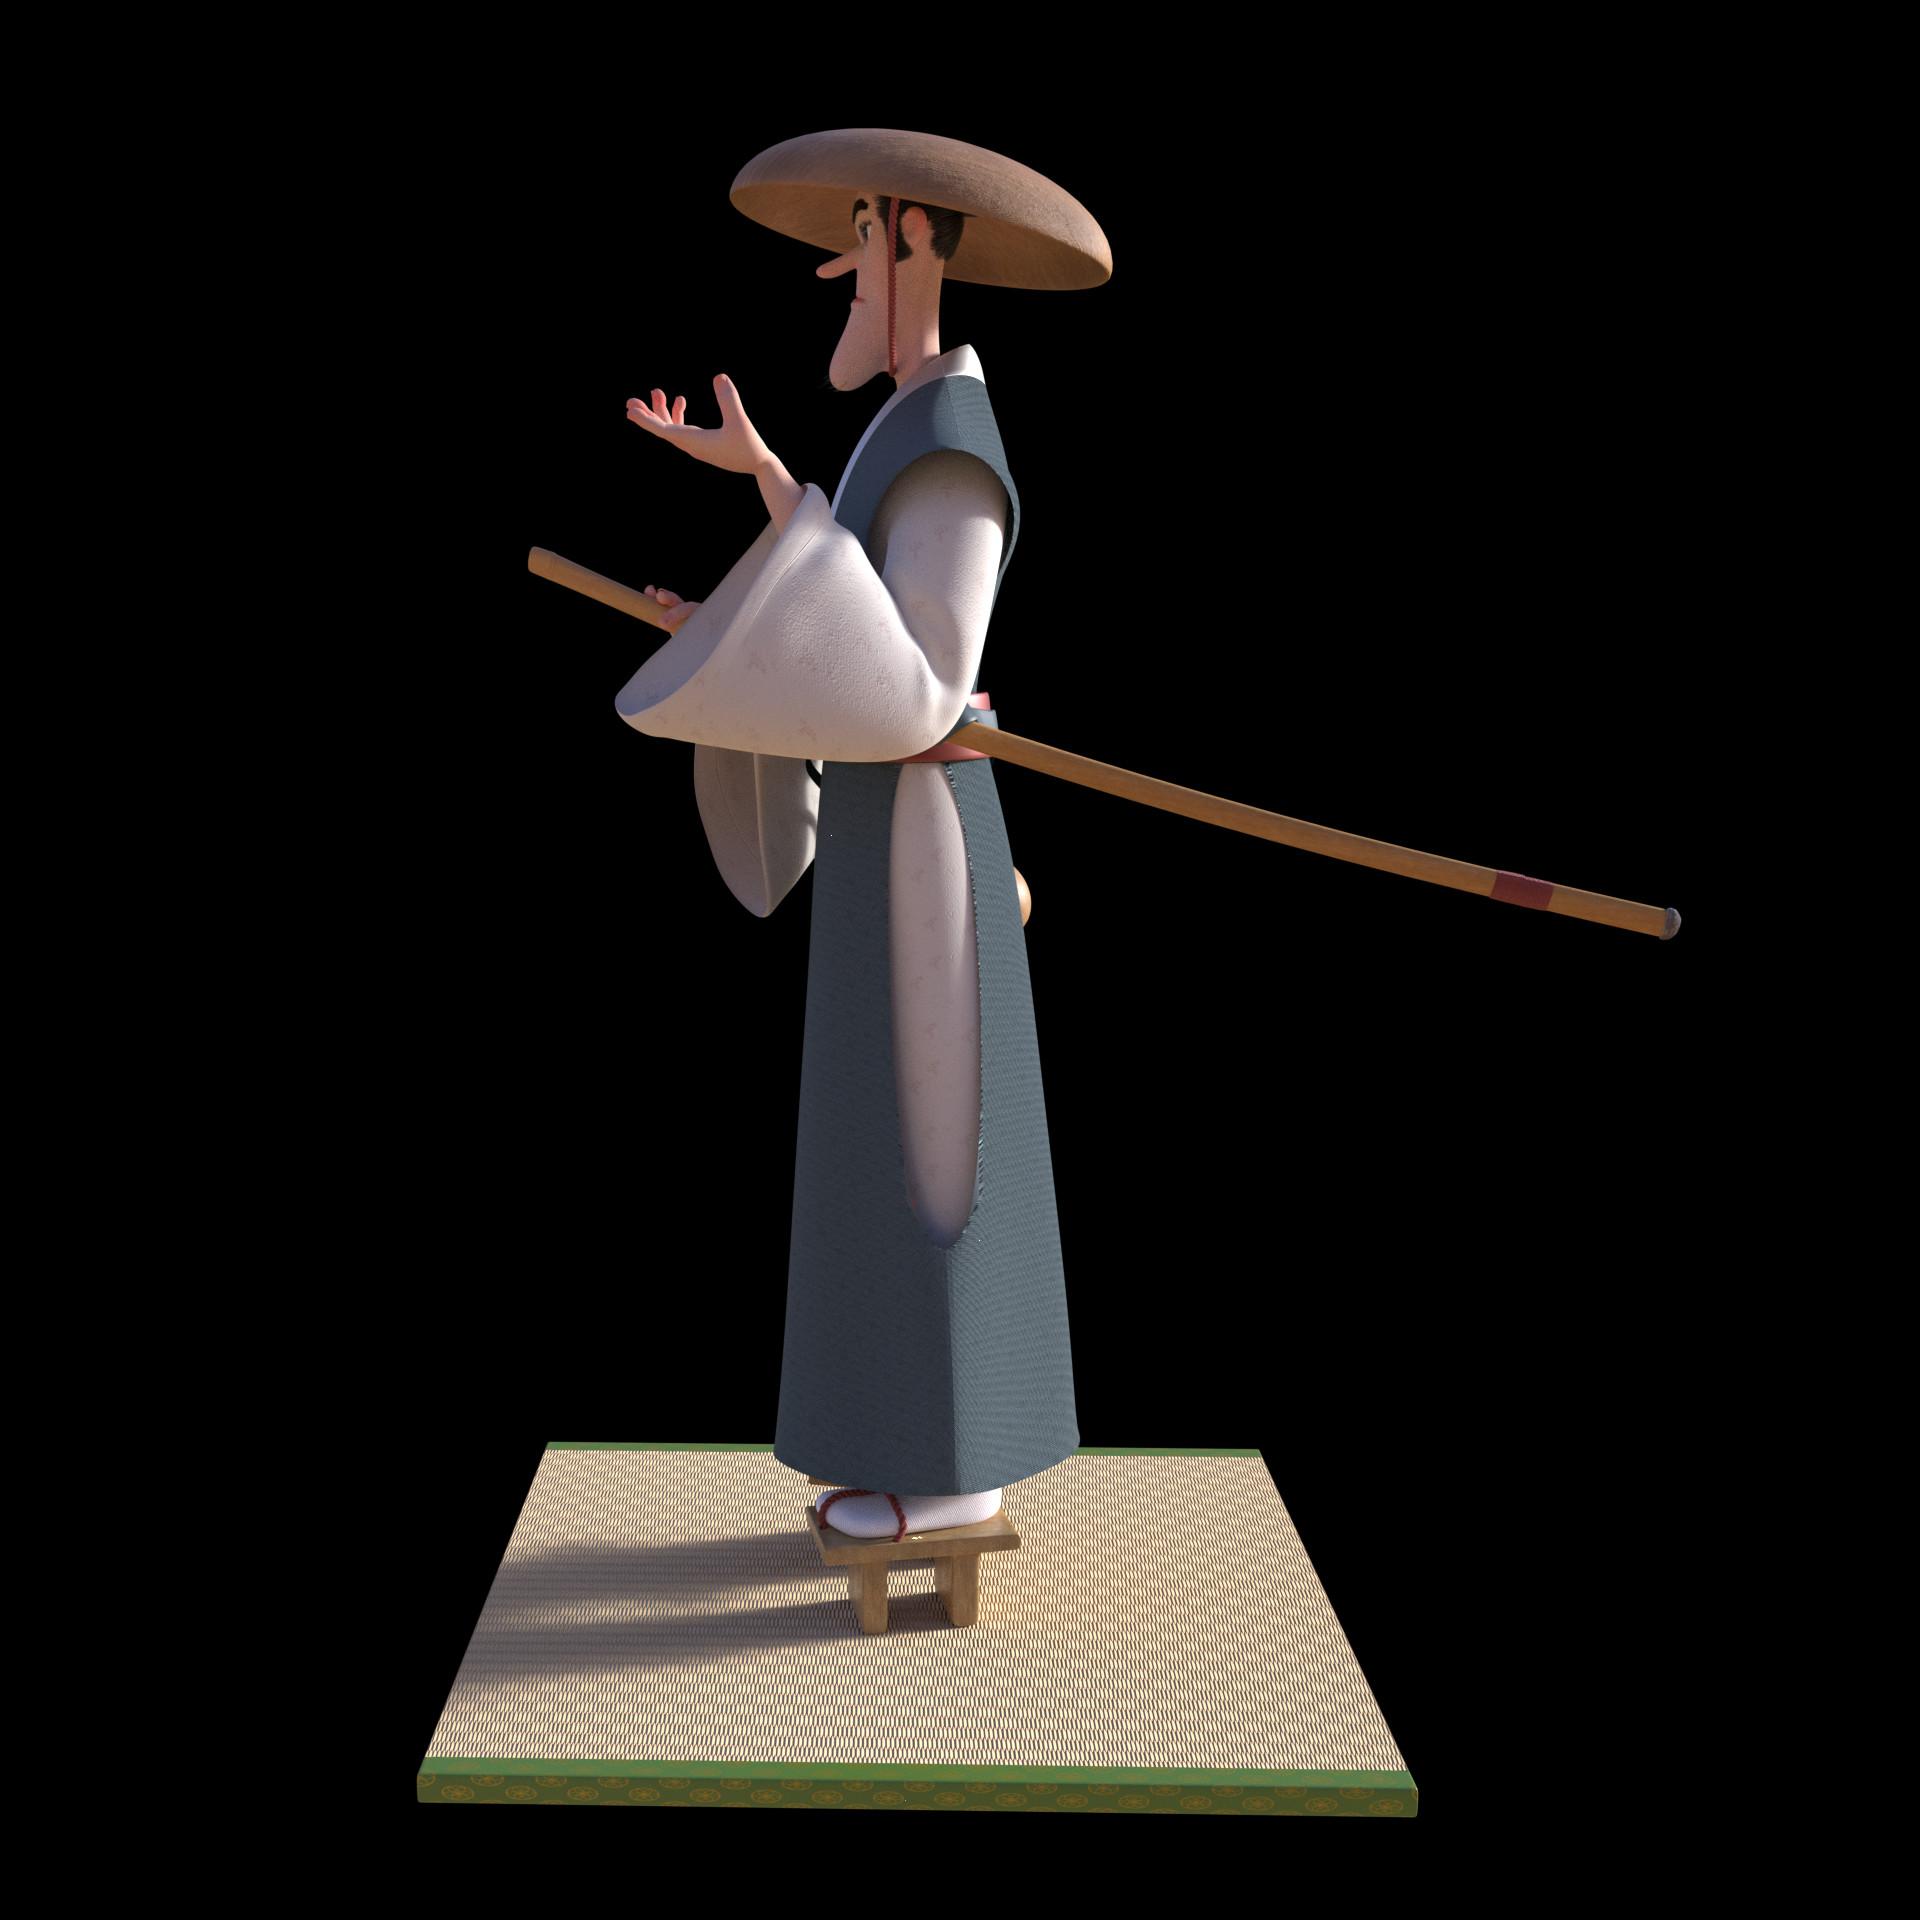 Daniel ajagbe soaked samurai beauty right